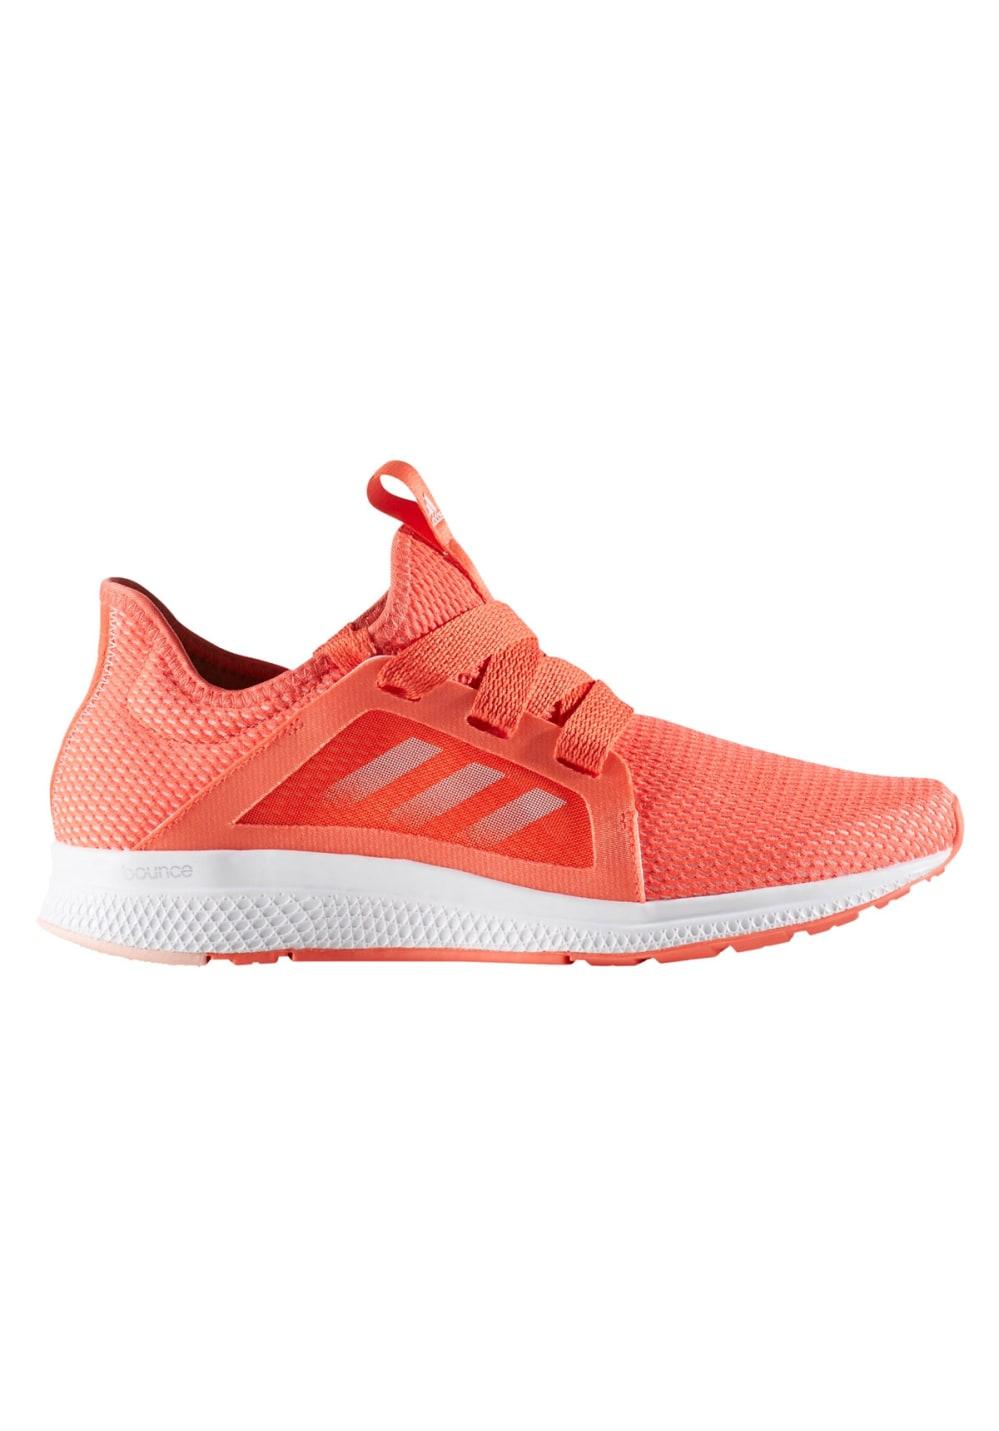 best wholesaler cfcf1 b0c25 Next. -60%. adidas. Edge Lux W - Chaussures running pour Femme. Prix normal  ...